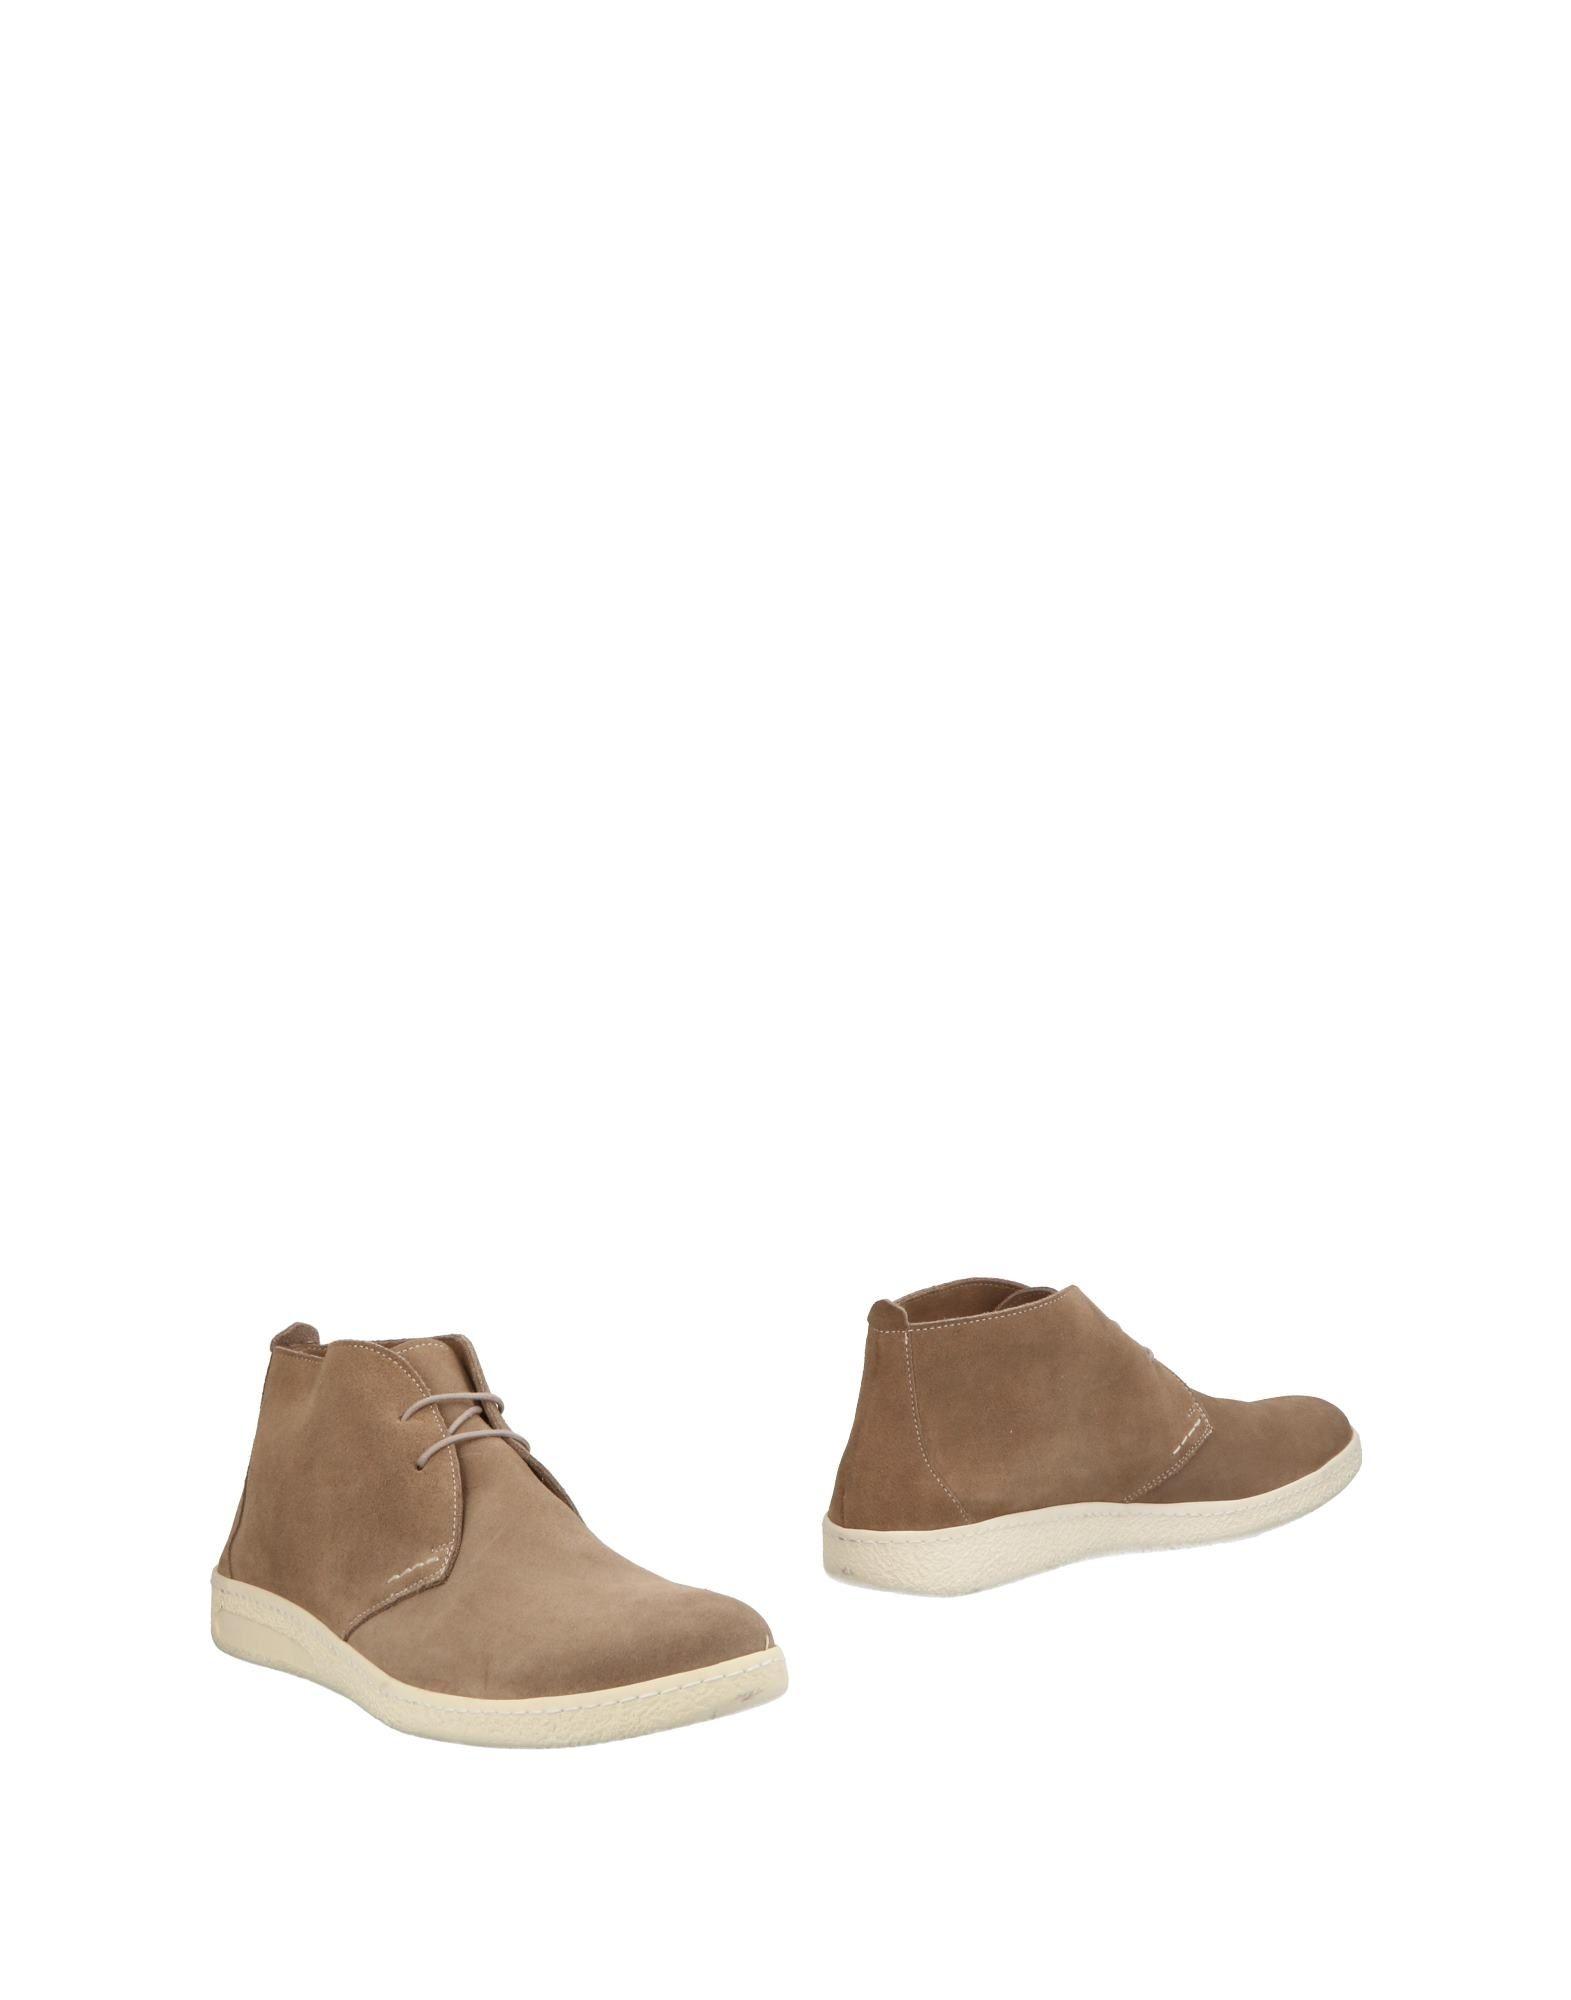 SEBOYS Boots in Khaki